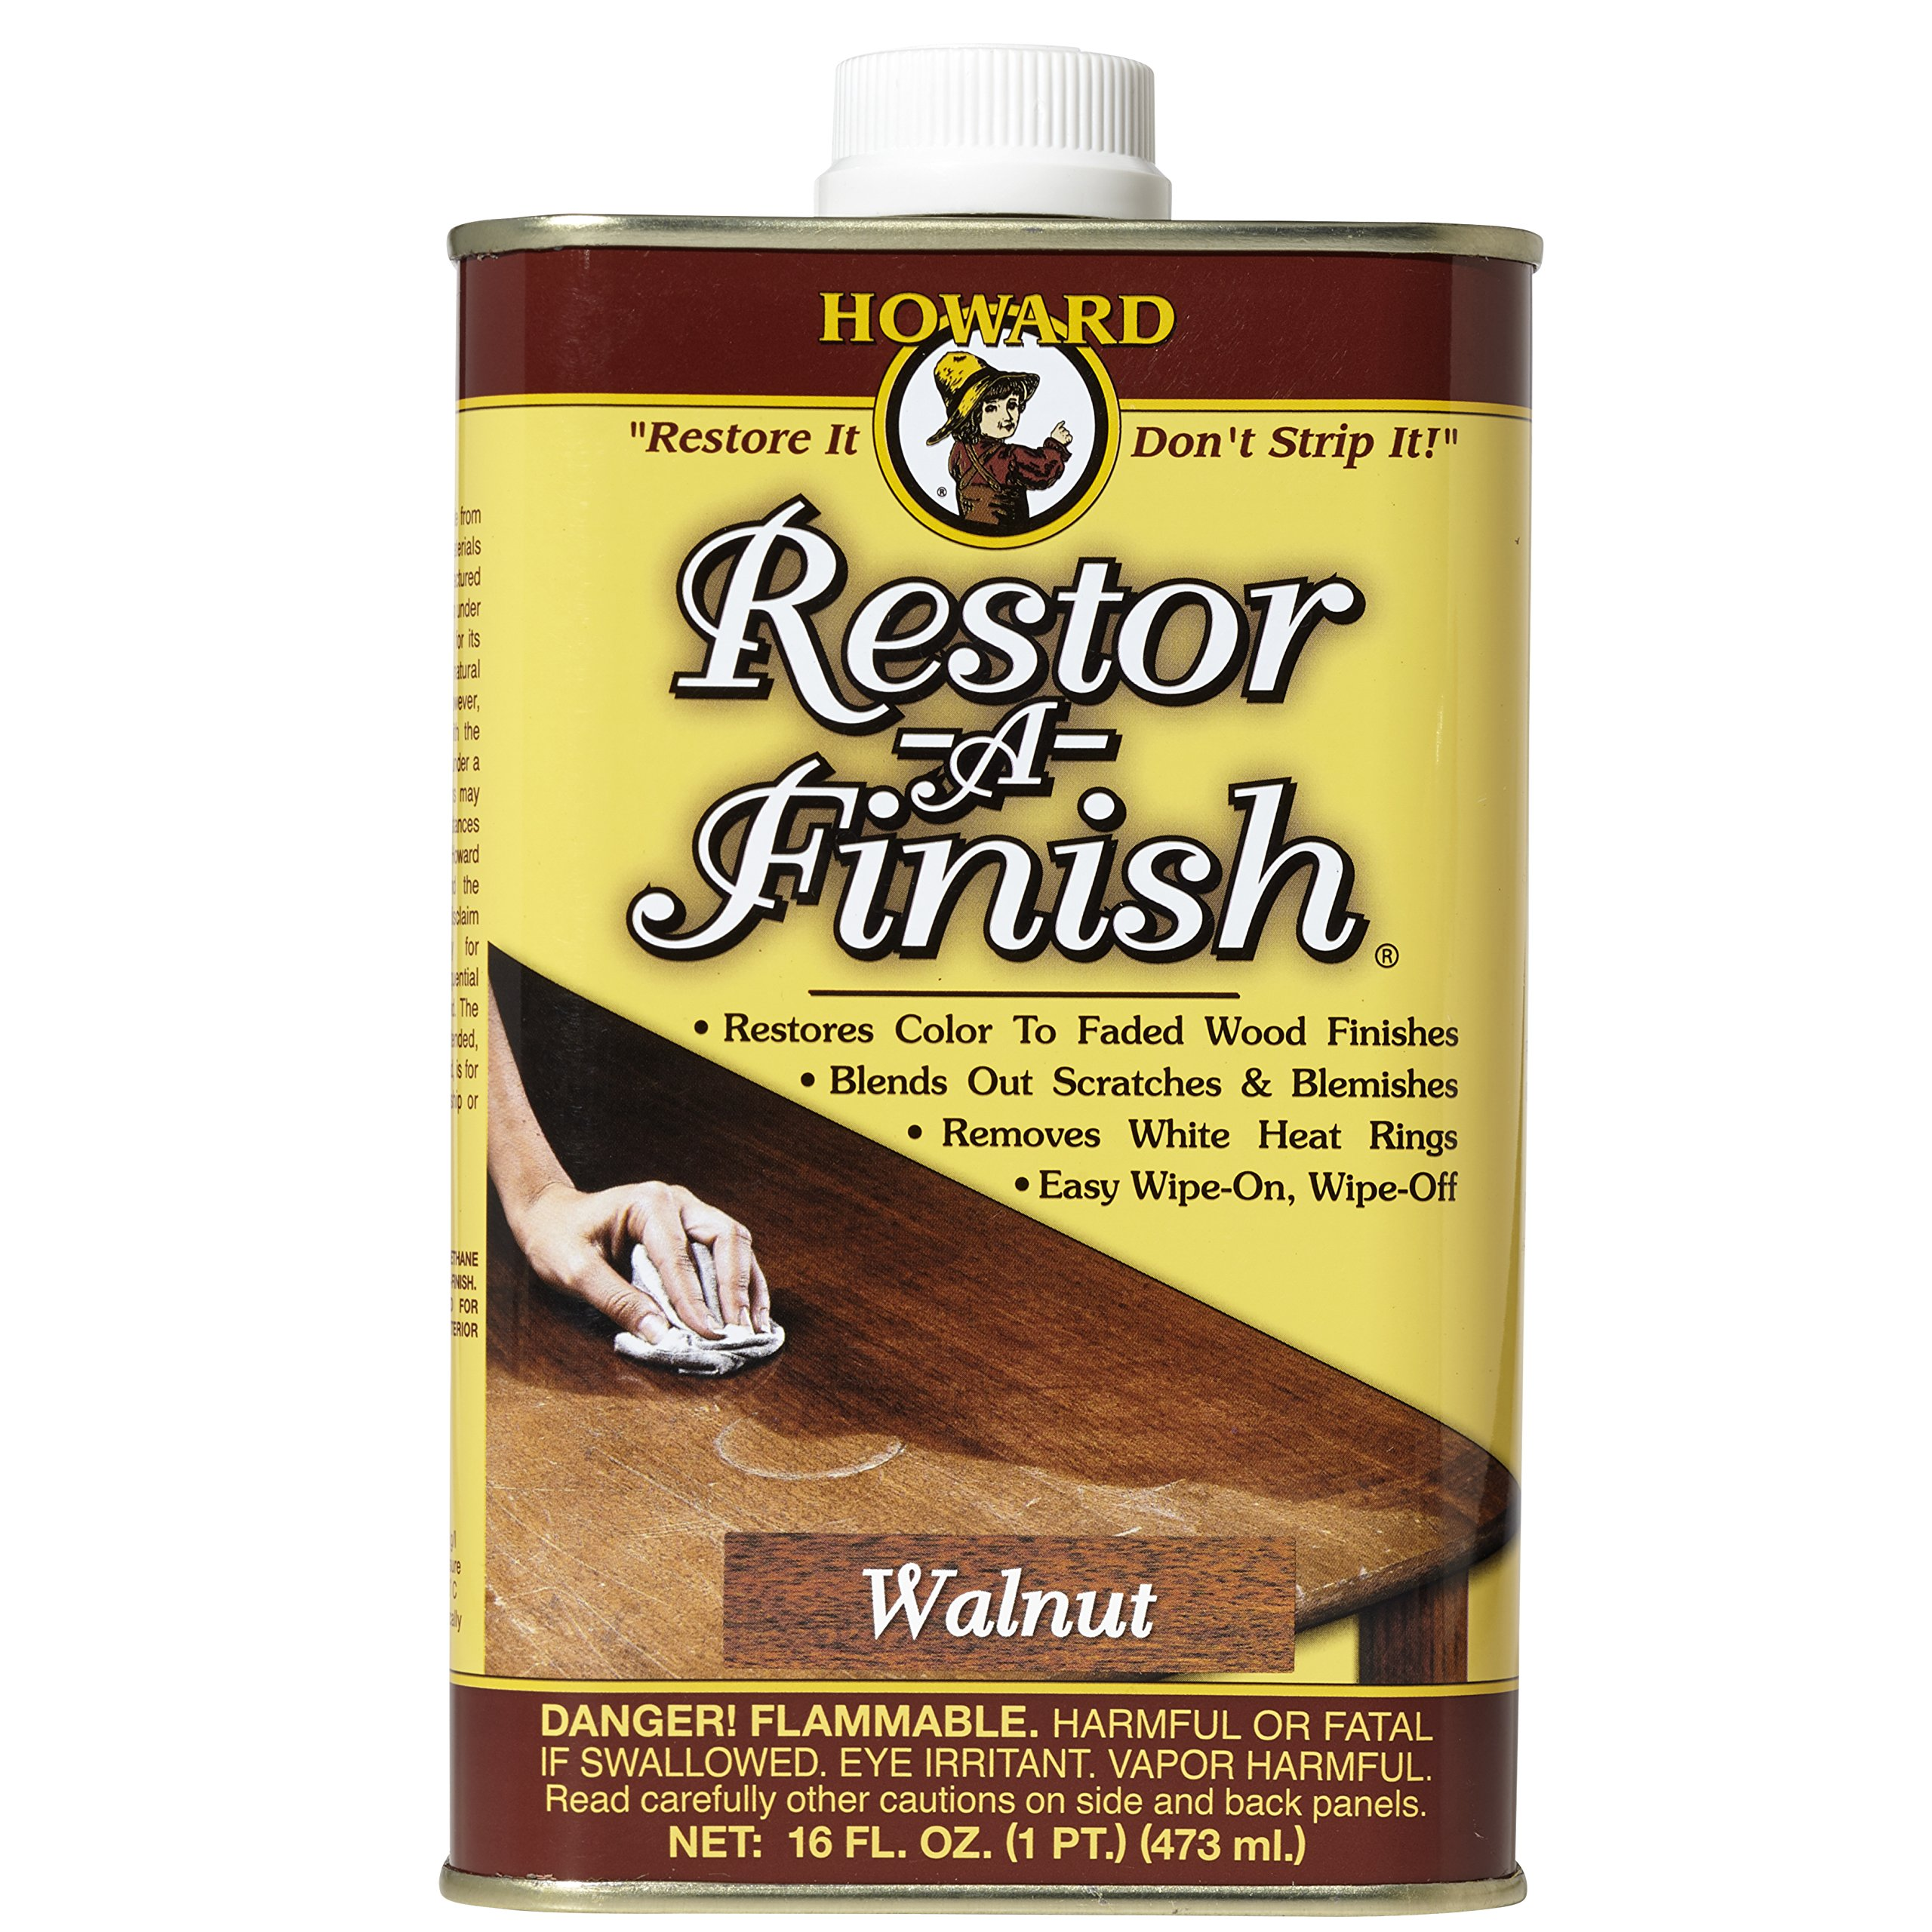 Howard Products RF4016 Restor-A-Finish, 16 oz, Walnut, 16 Fl Oz